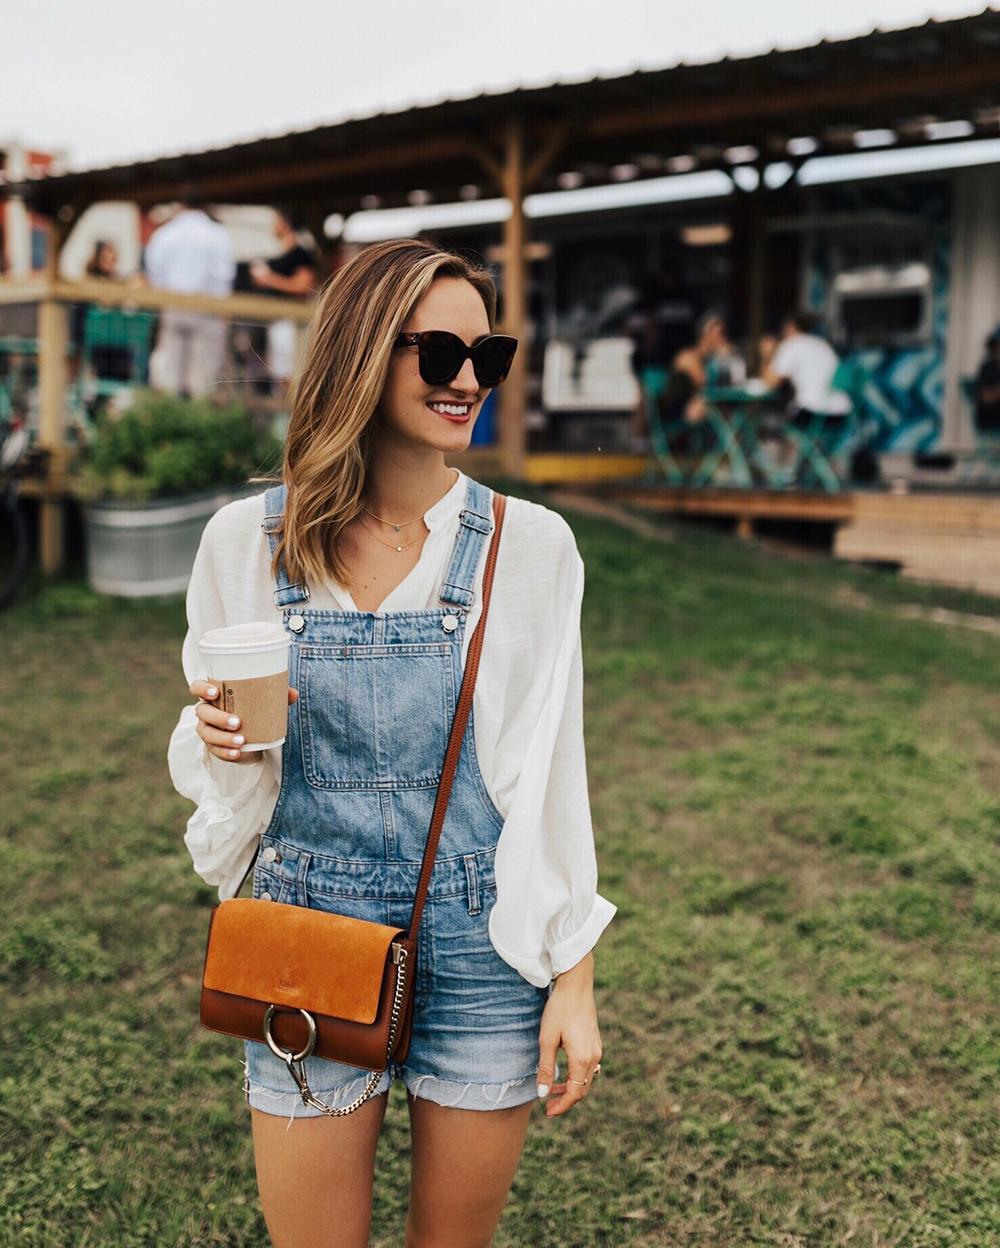 livvyland-blog-olivia-watson-instagram-roundup-june-summer-style-overalls-picnik-austin